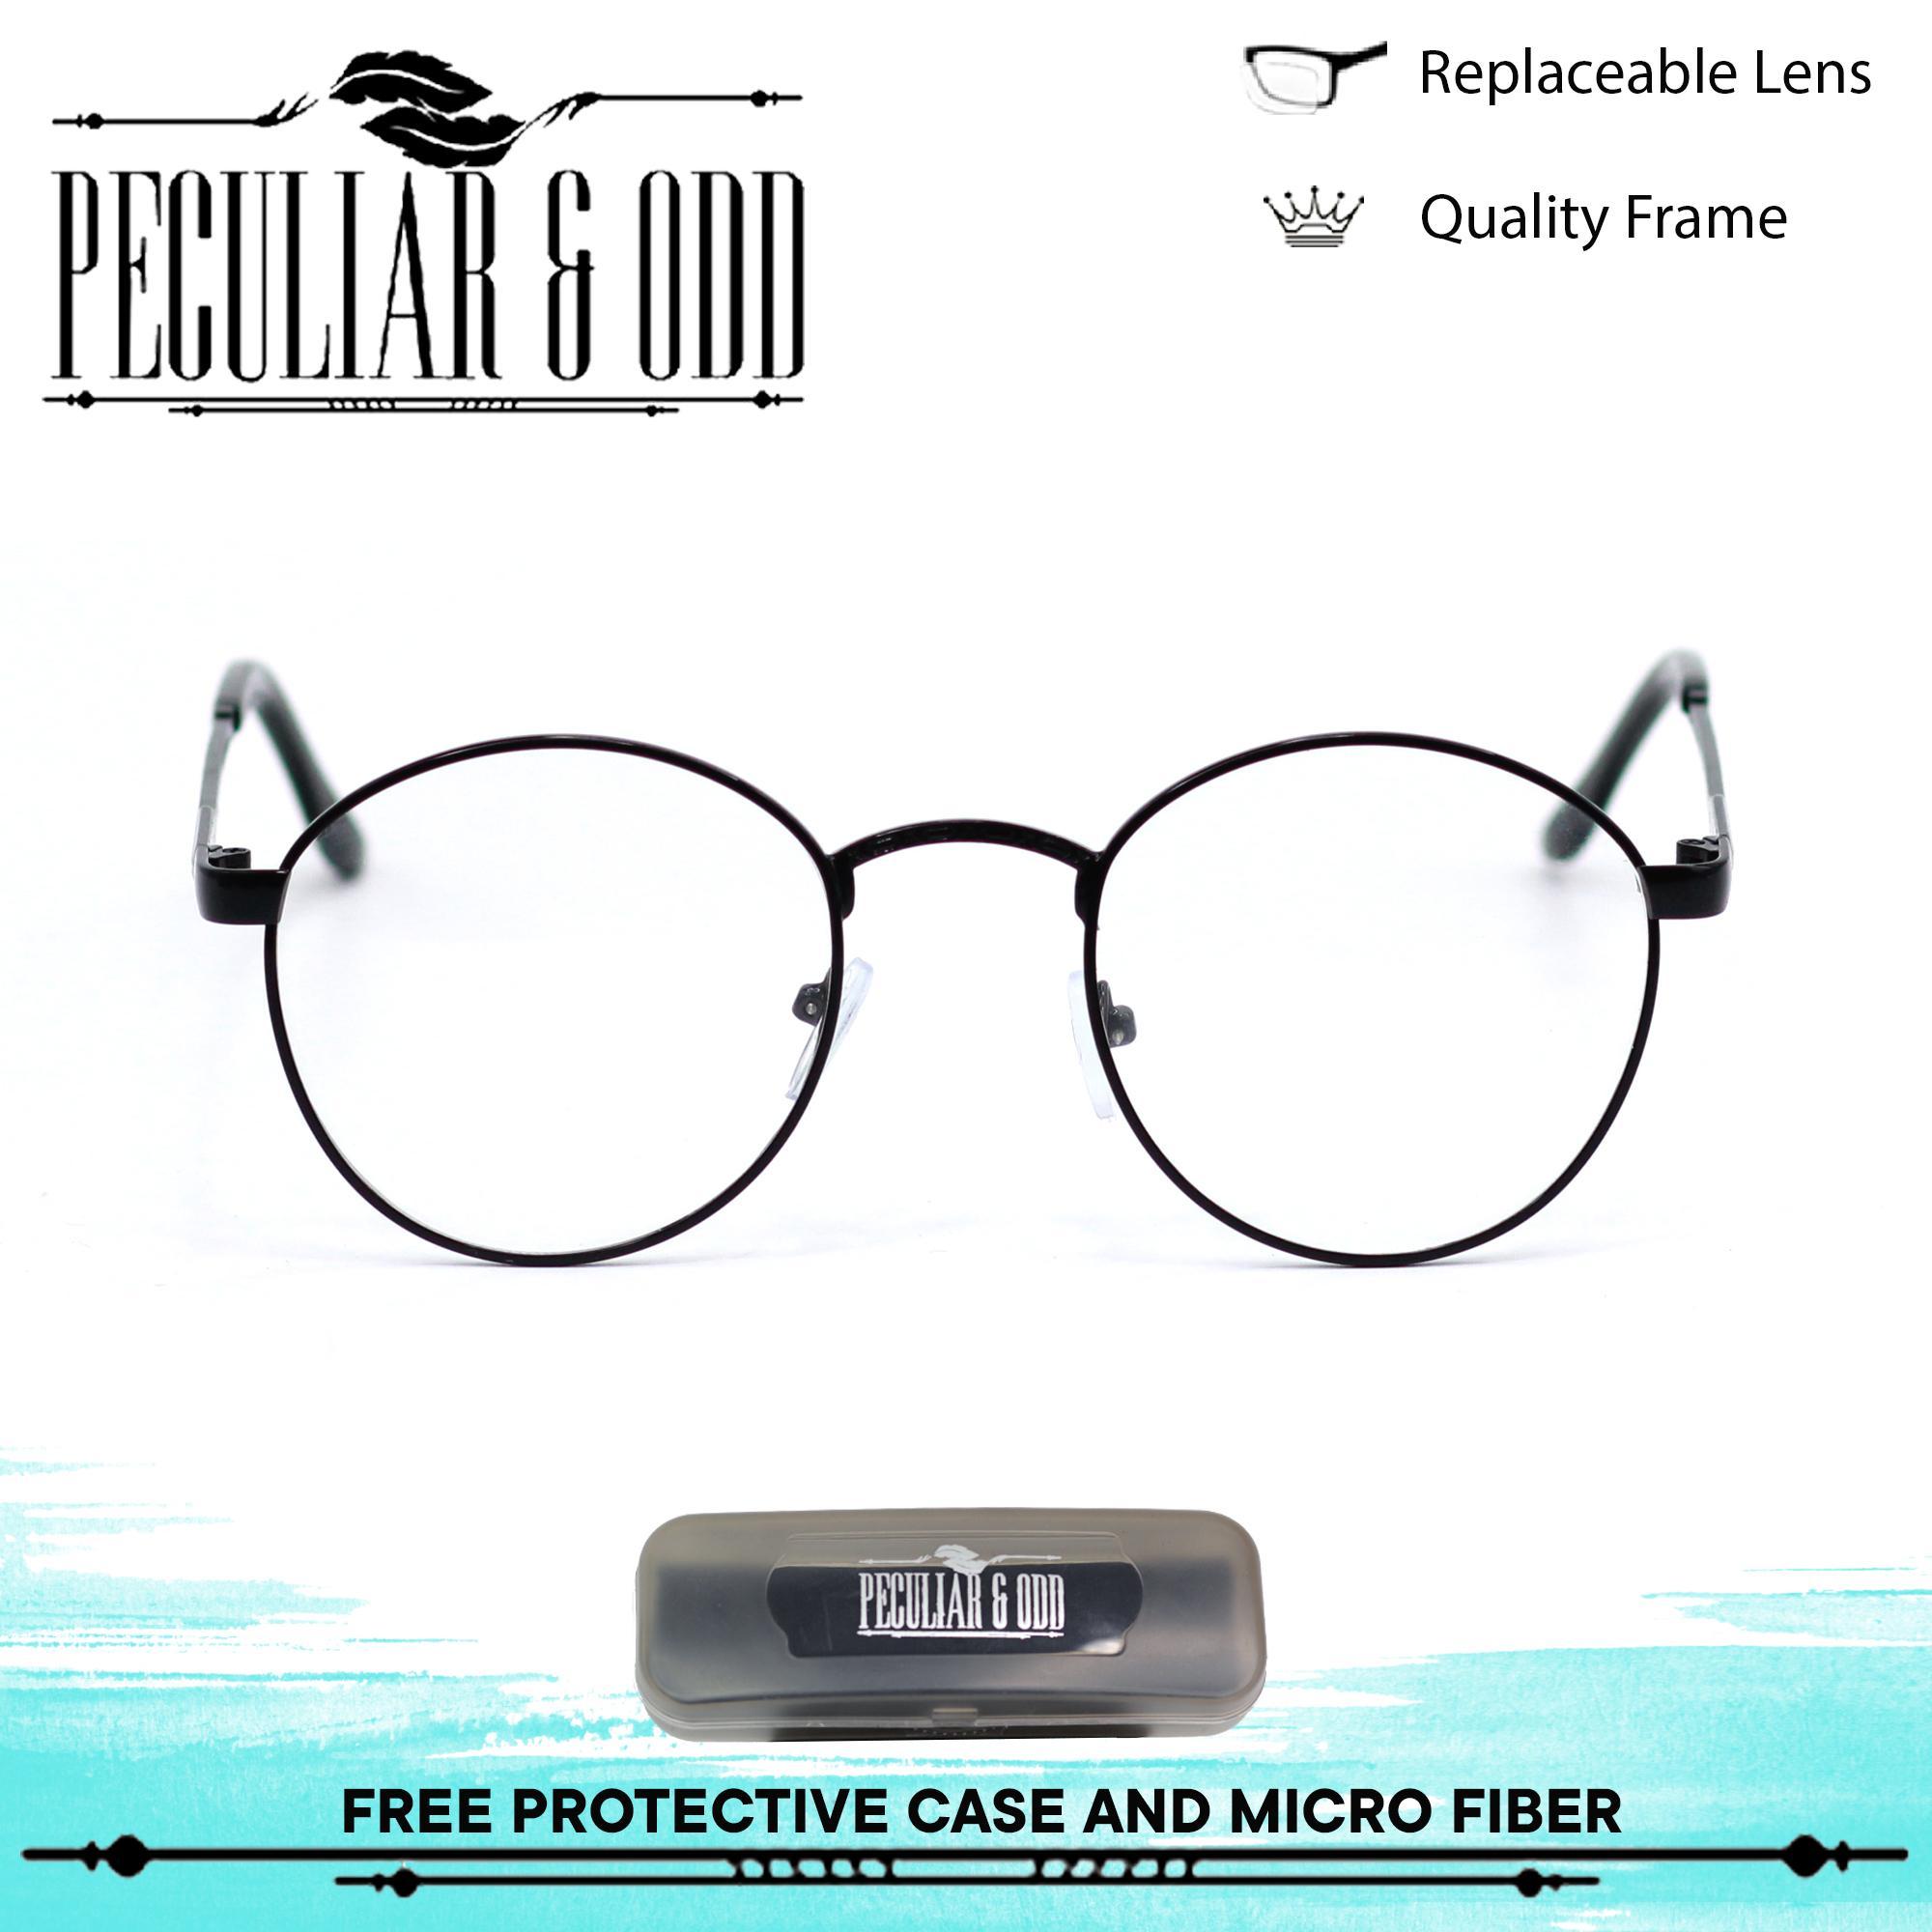 7a39203590 Premium Edition Round Vintage Slim Metal Glasses 016 Black inBlack Frame  Optical Replaceable Lens Unisex Eyewear